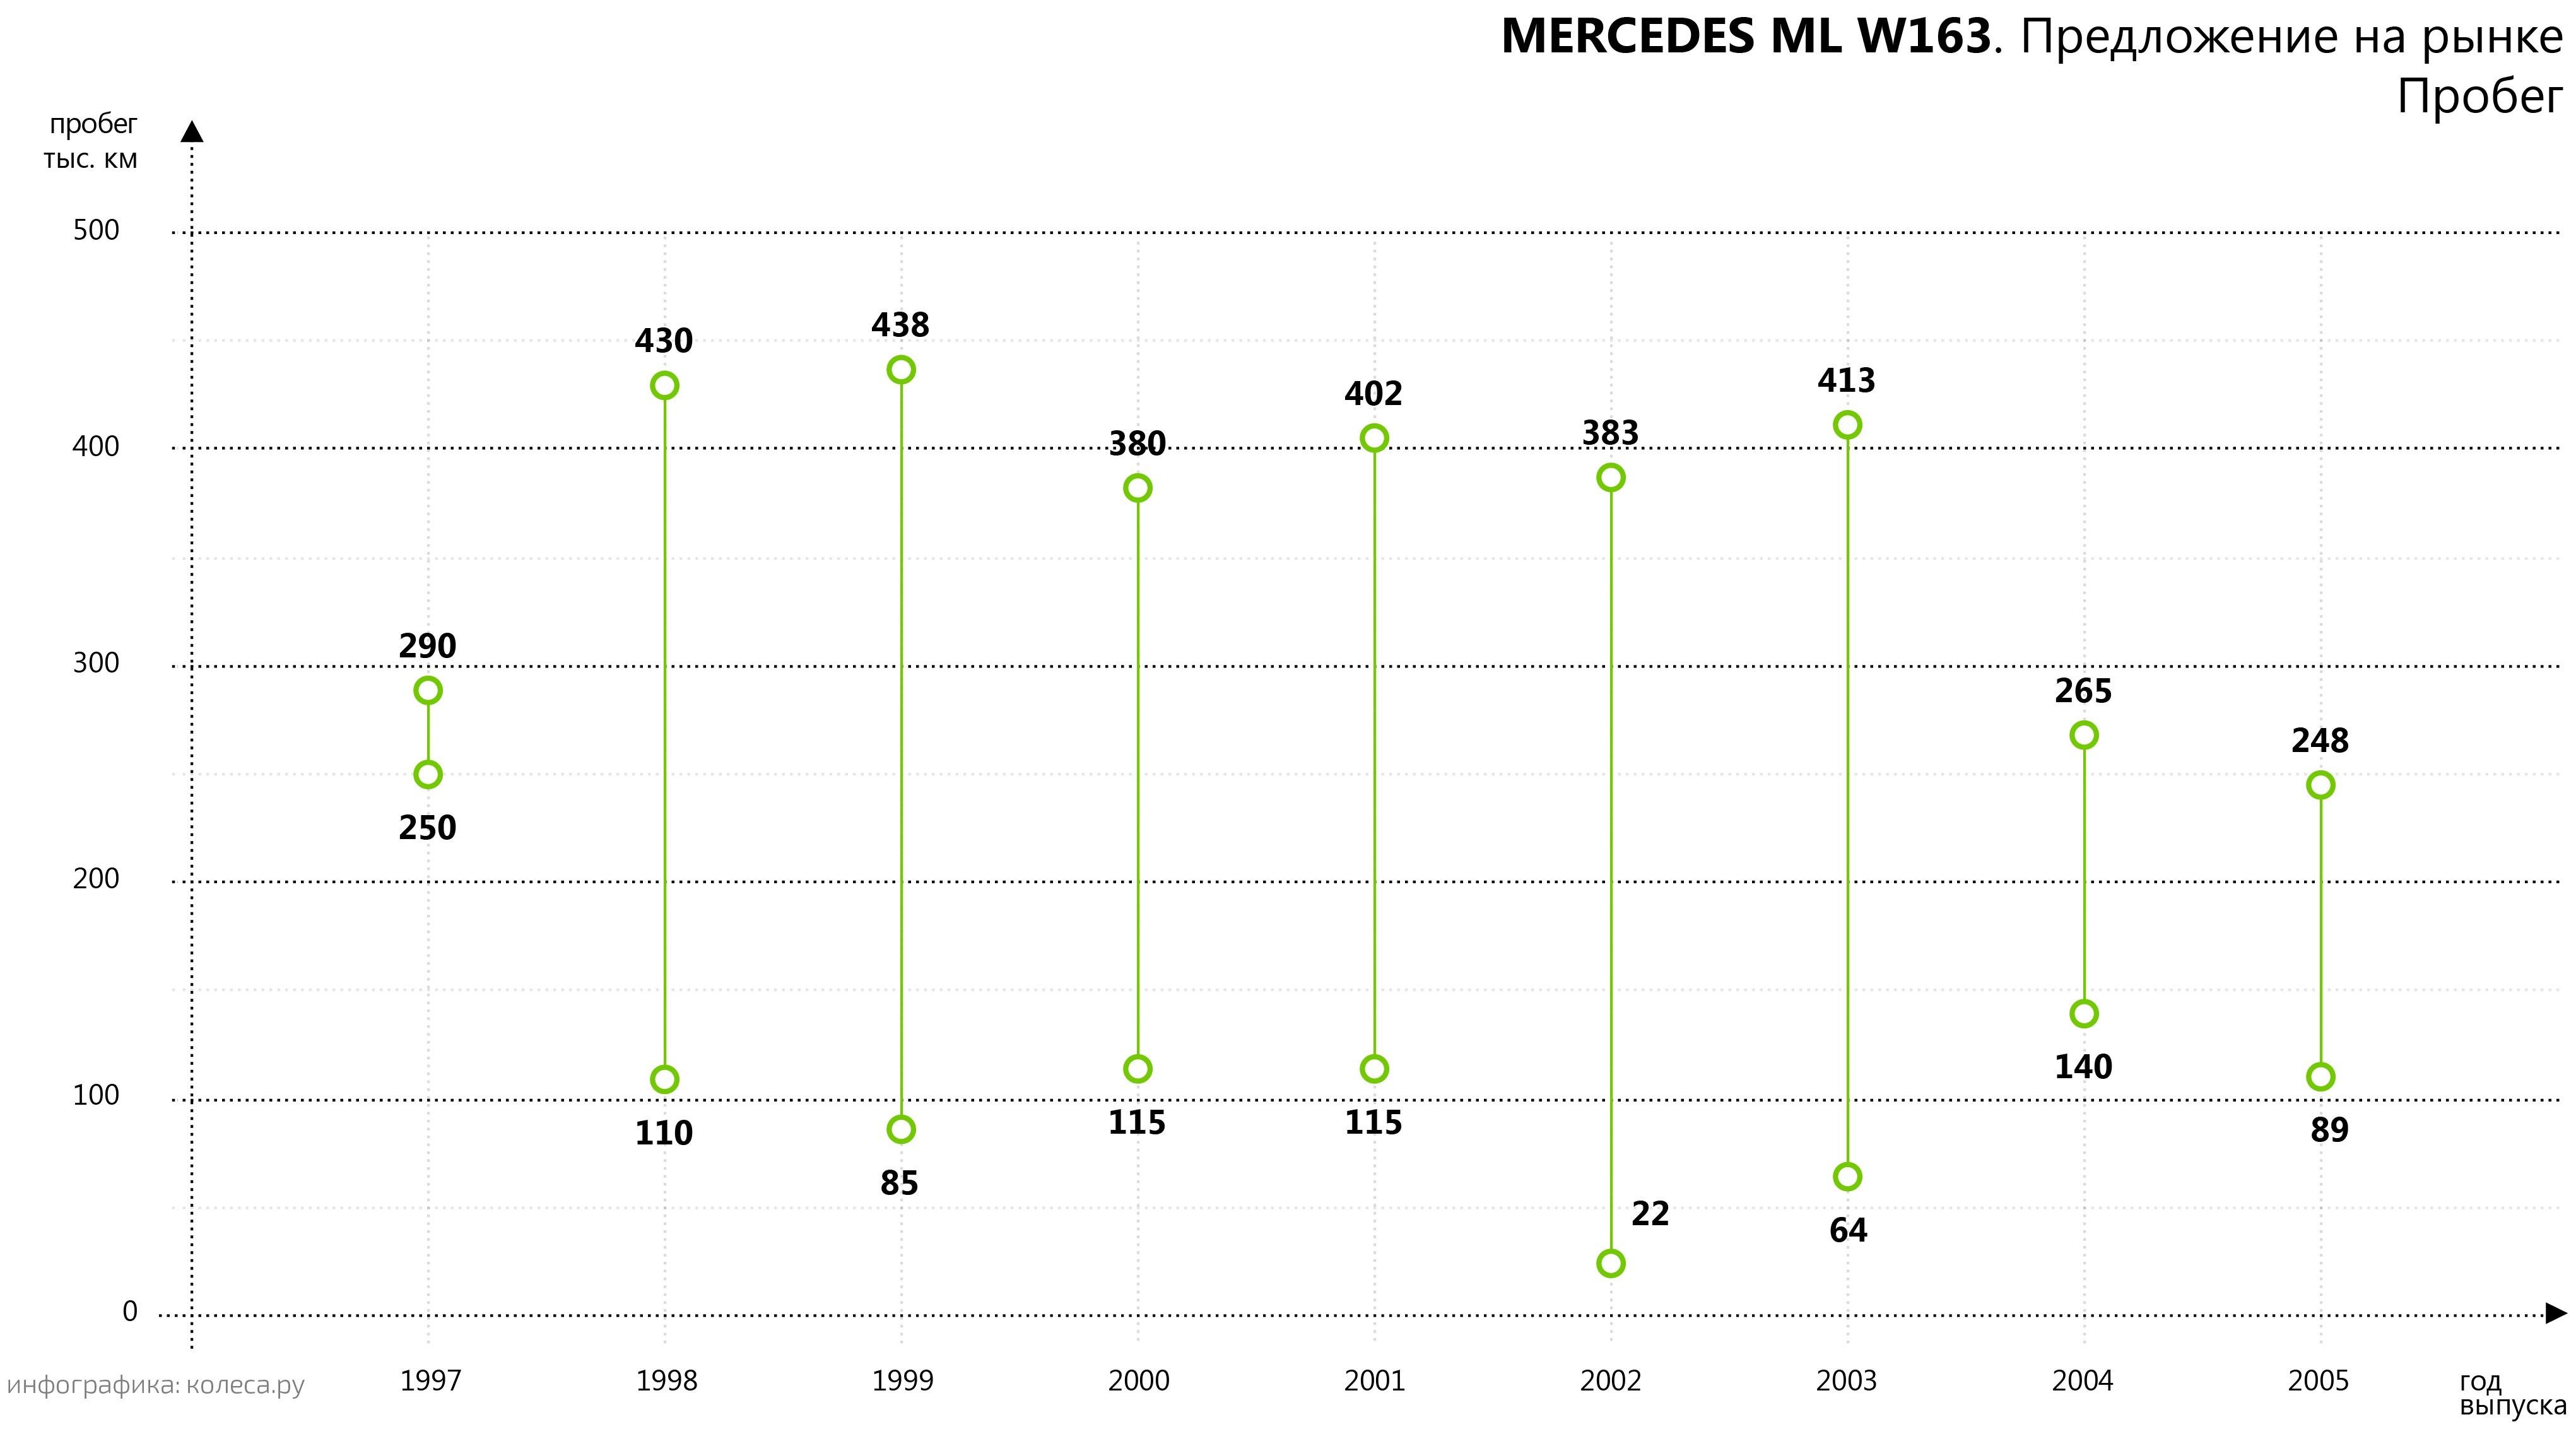 original-mercedes_ml_w163-01-02